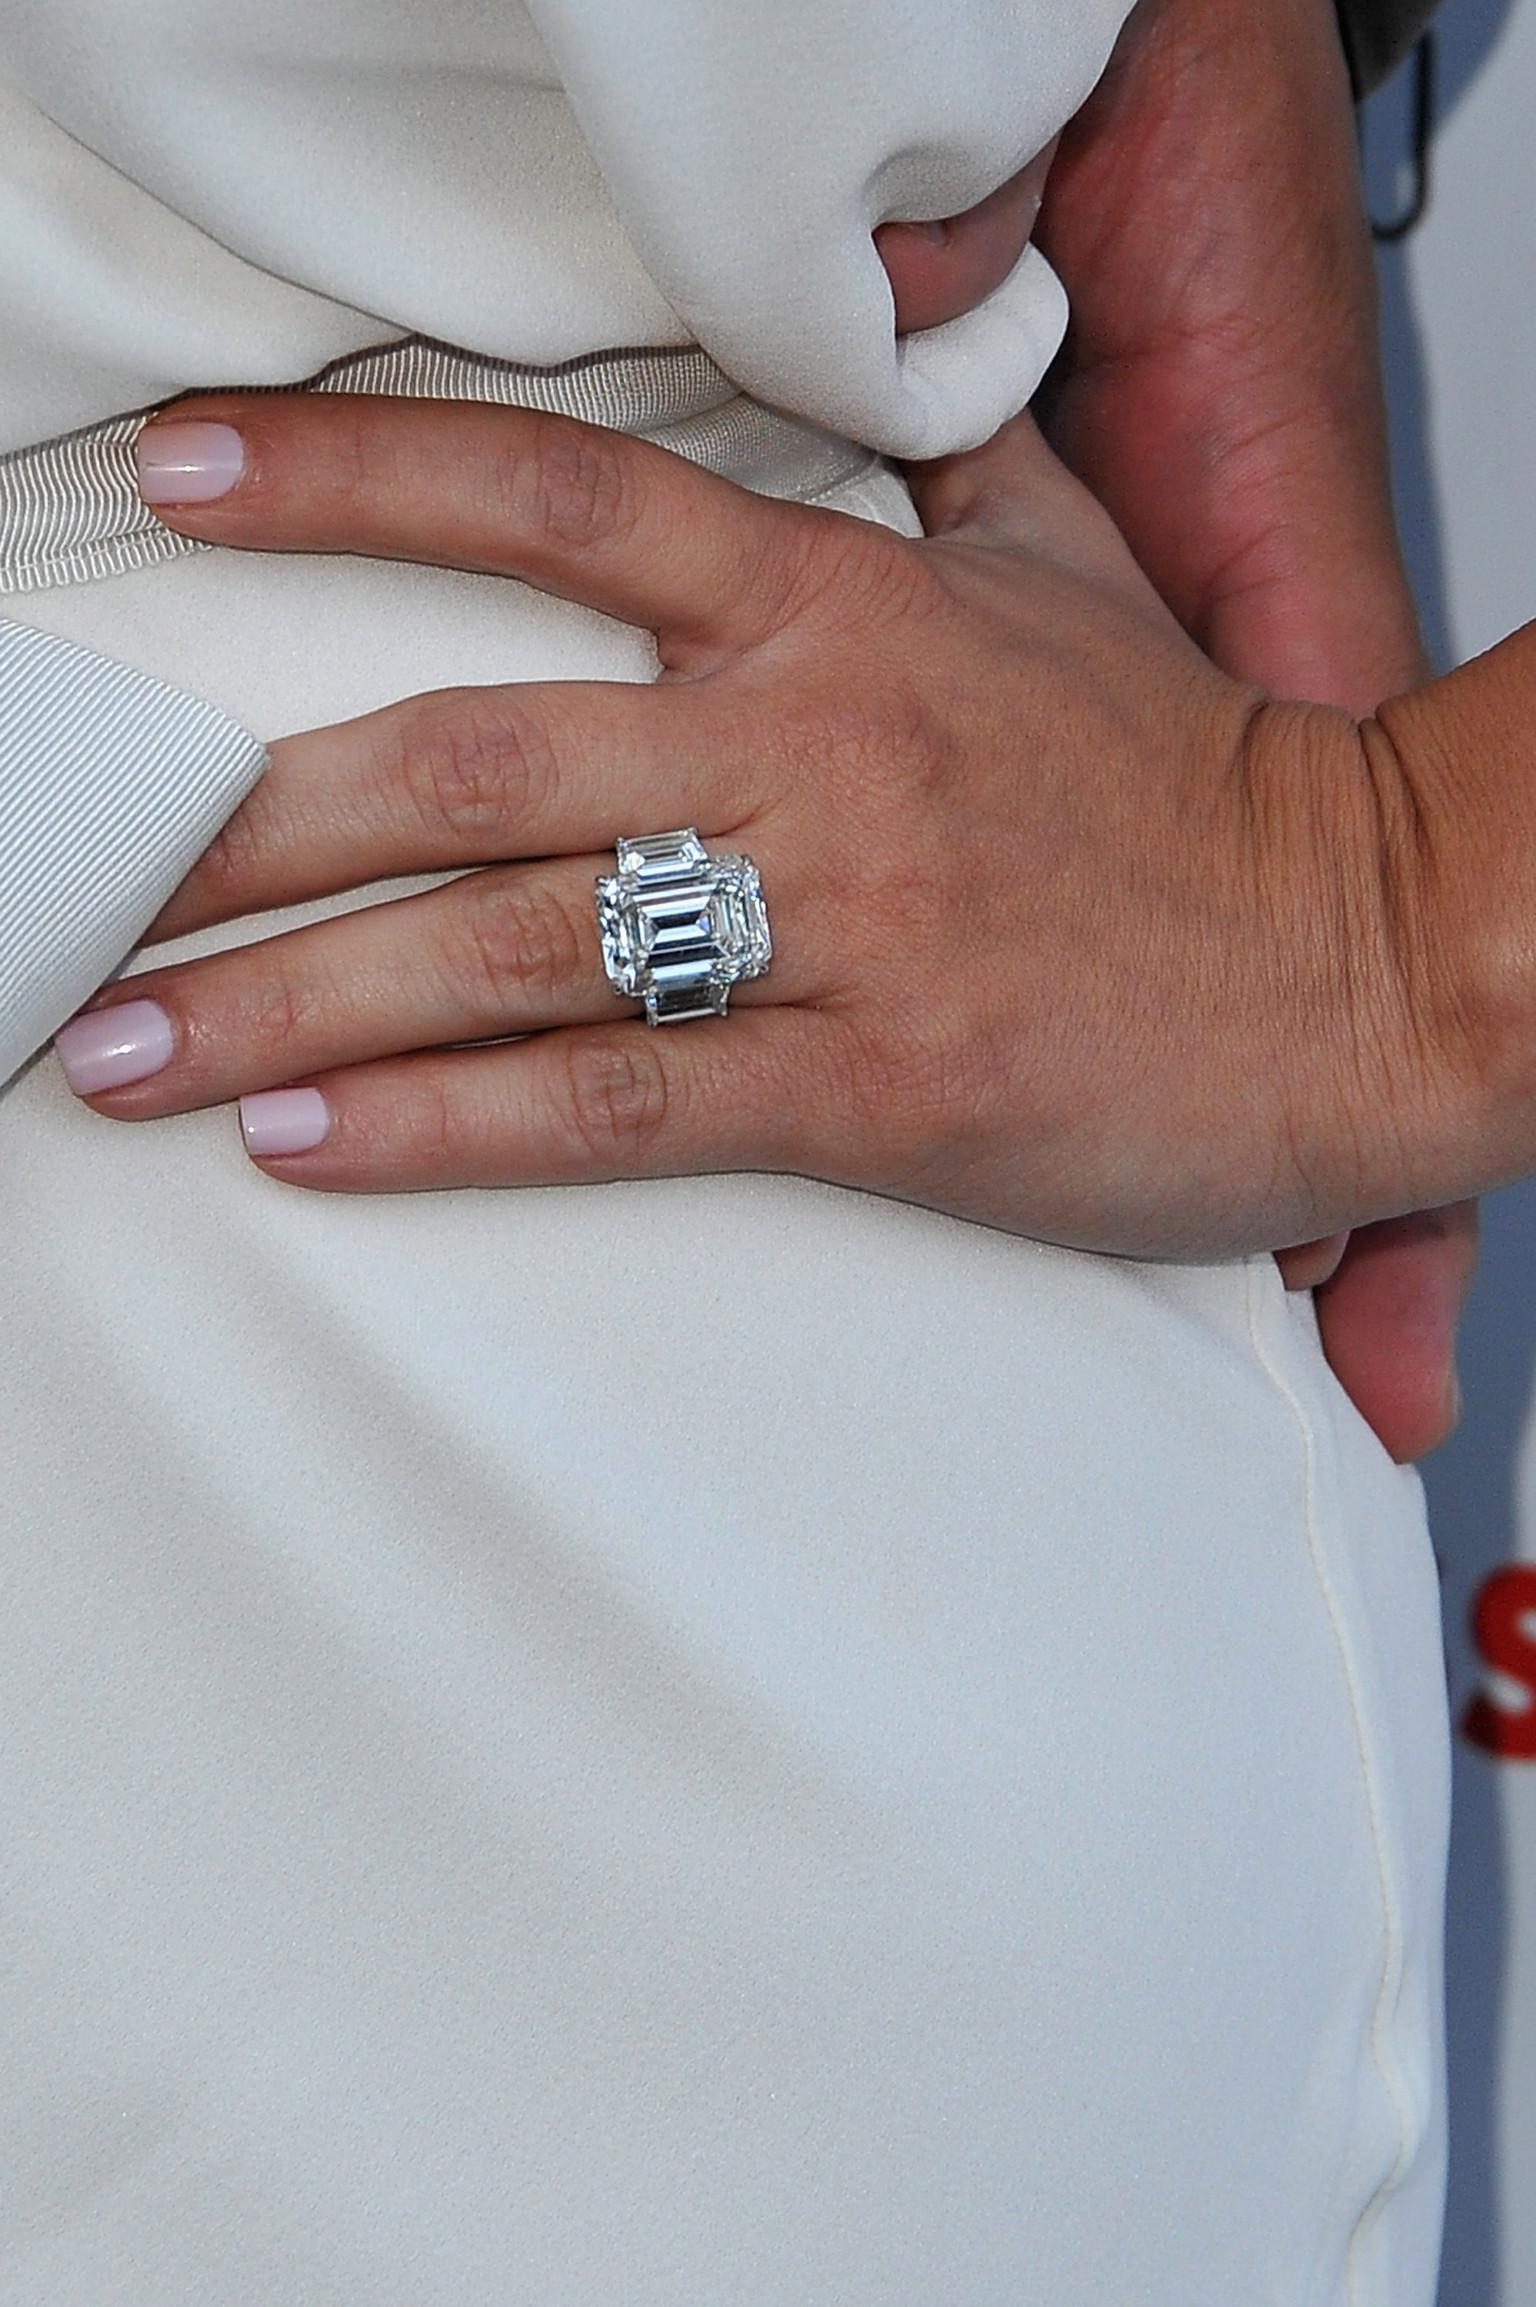 Kim Kardashian Divorce Saga Continues As Kris Humphries Auctions Off Engagement Ring